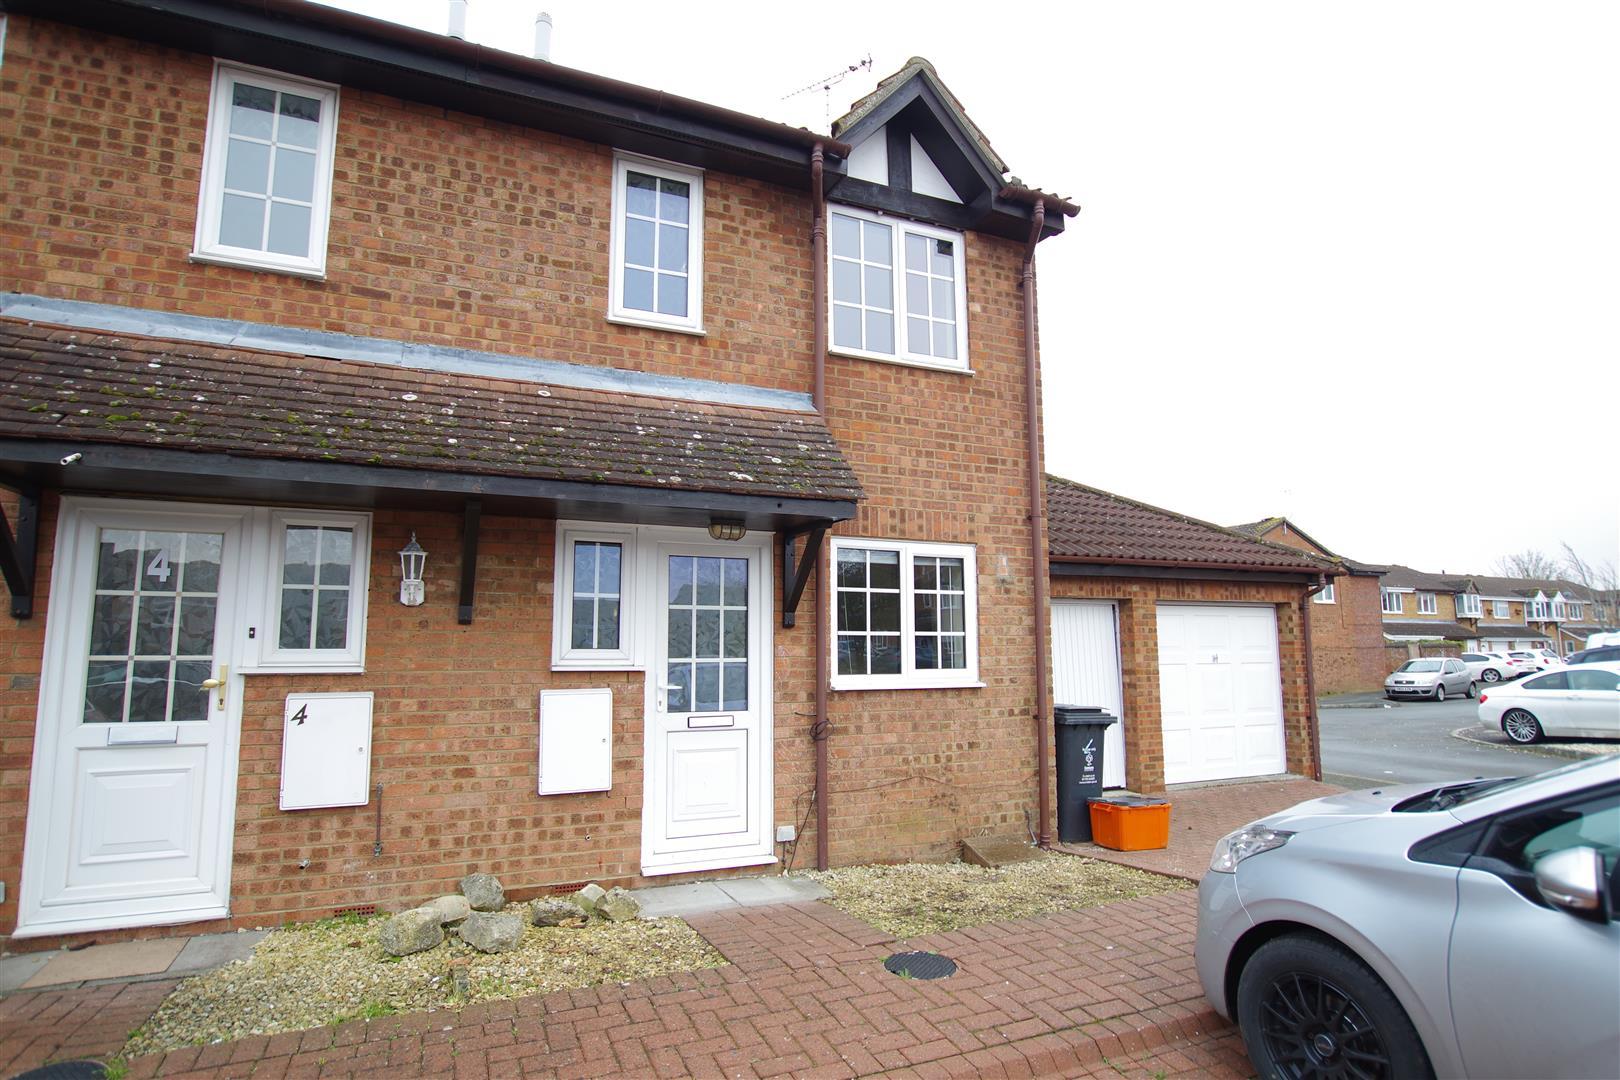 Bowman Close, Stratone Village, Swindon